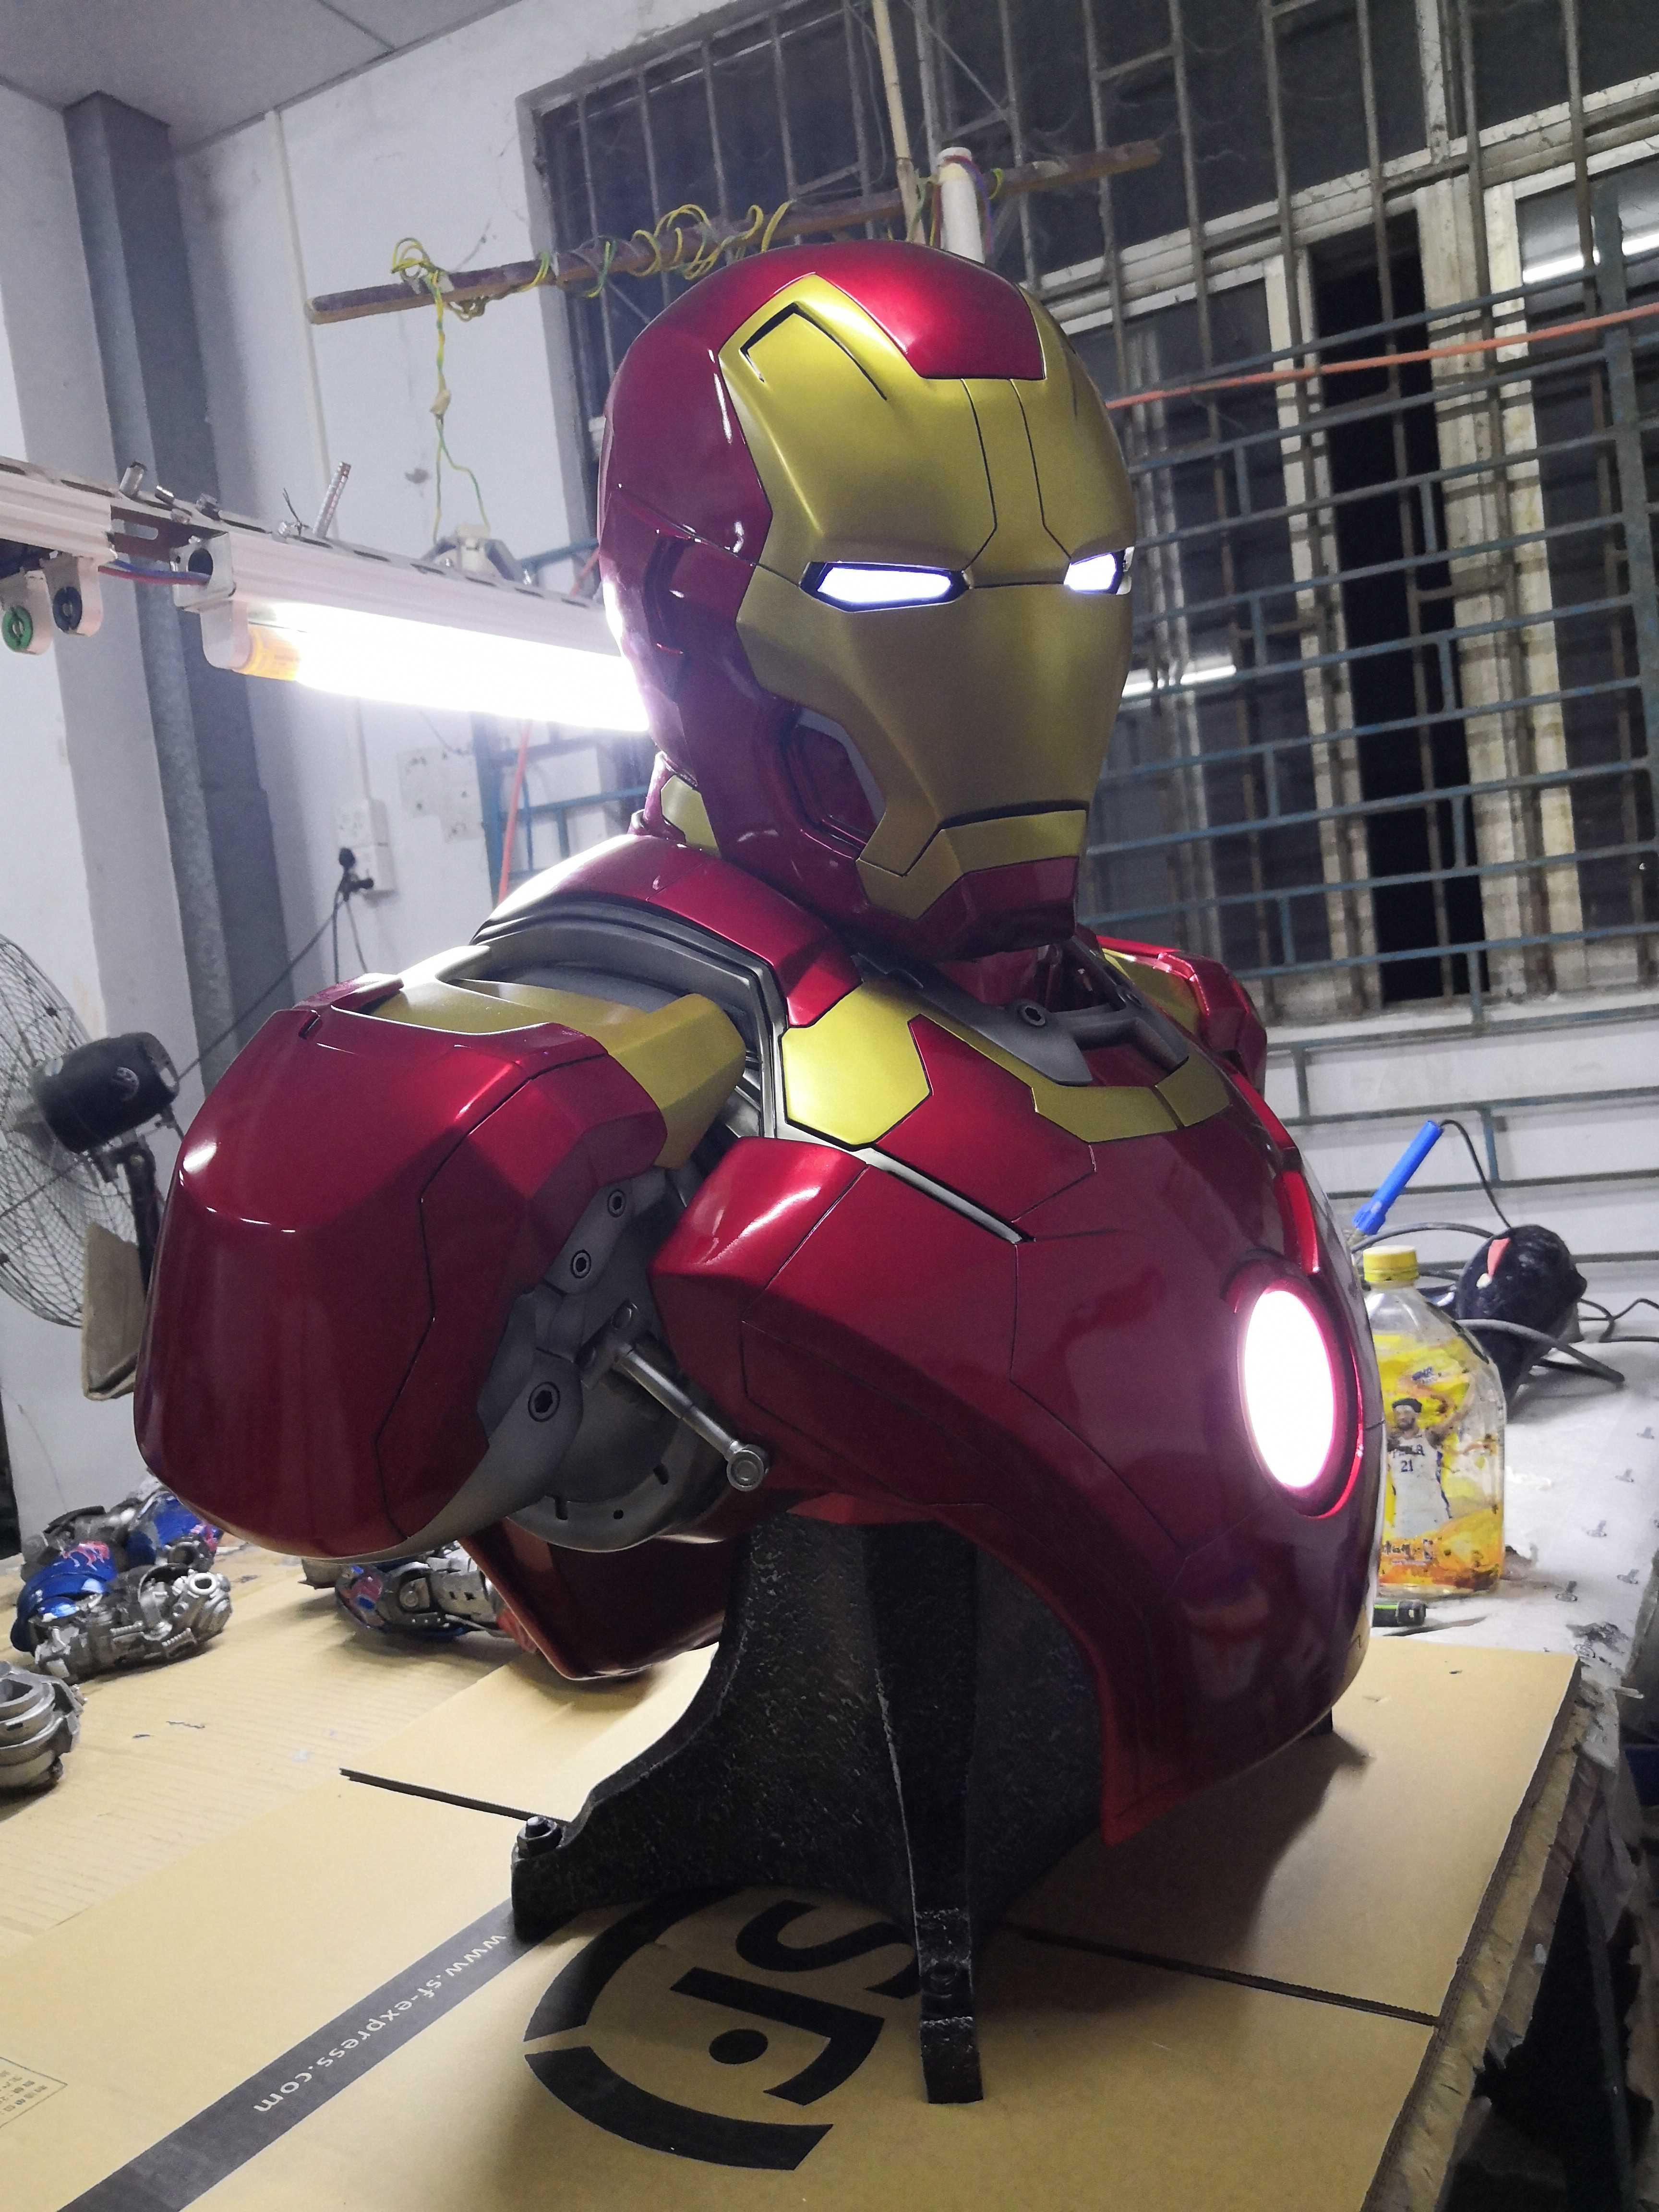 Бюст Железный Человек МК 43 Светильник - hfdd17b57269348848463cf14b8932683k